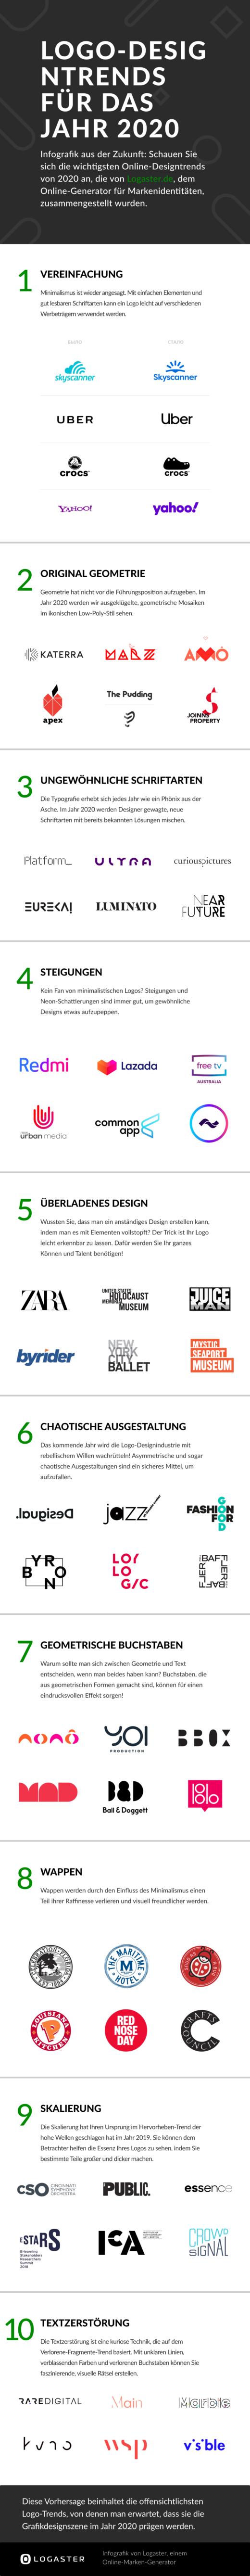 Infografik: Logo-Design Trends 2020